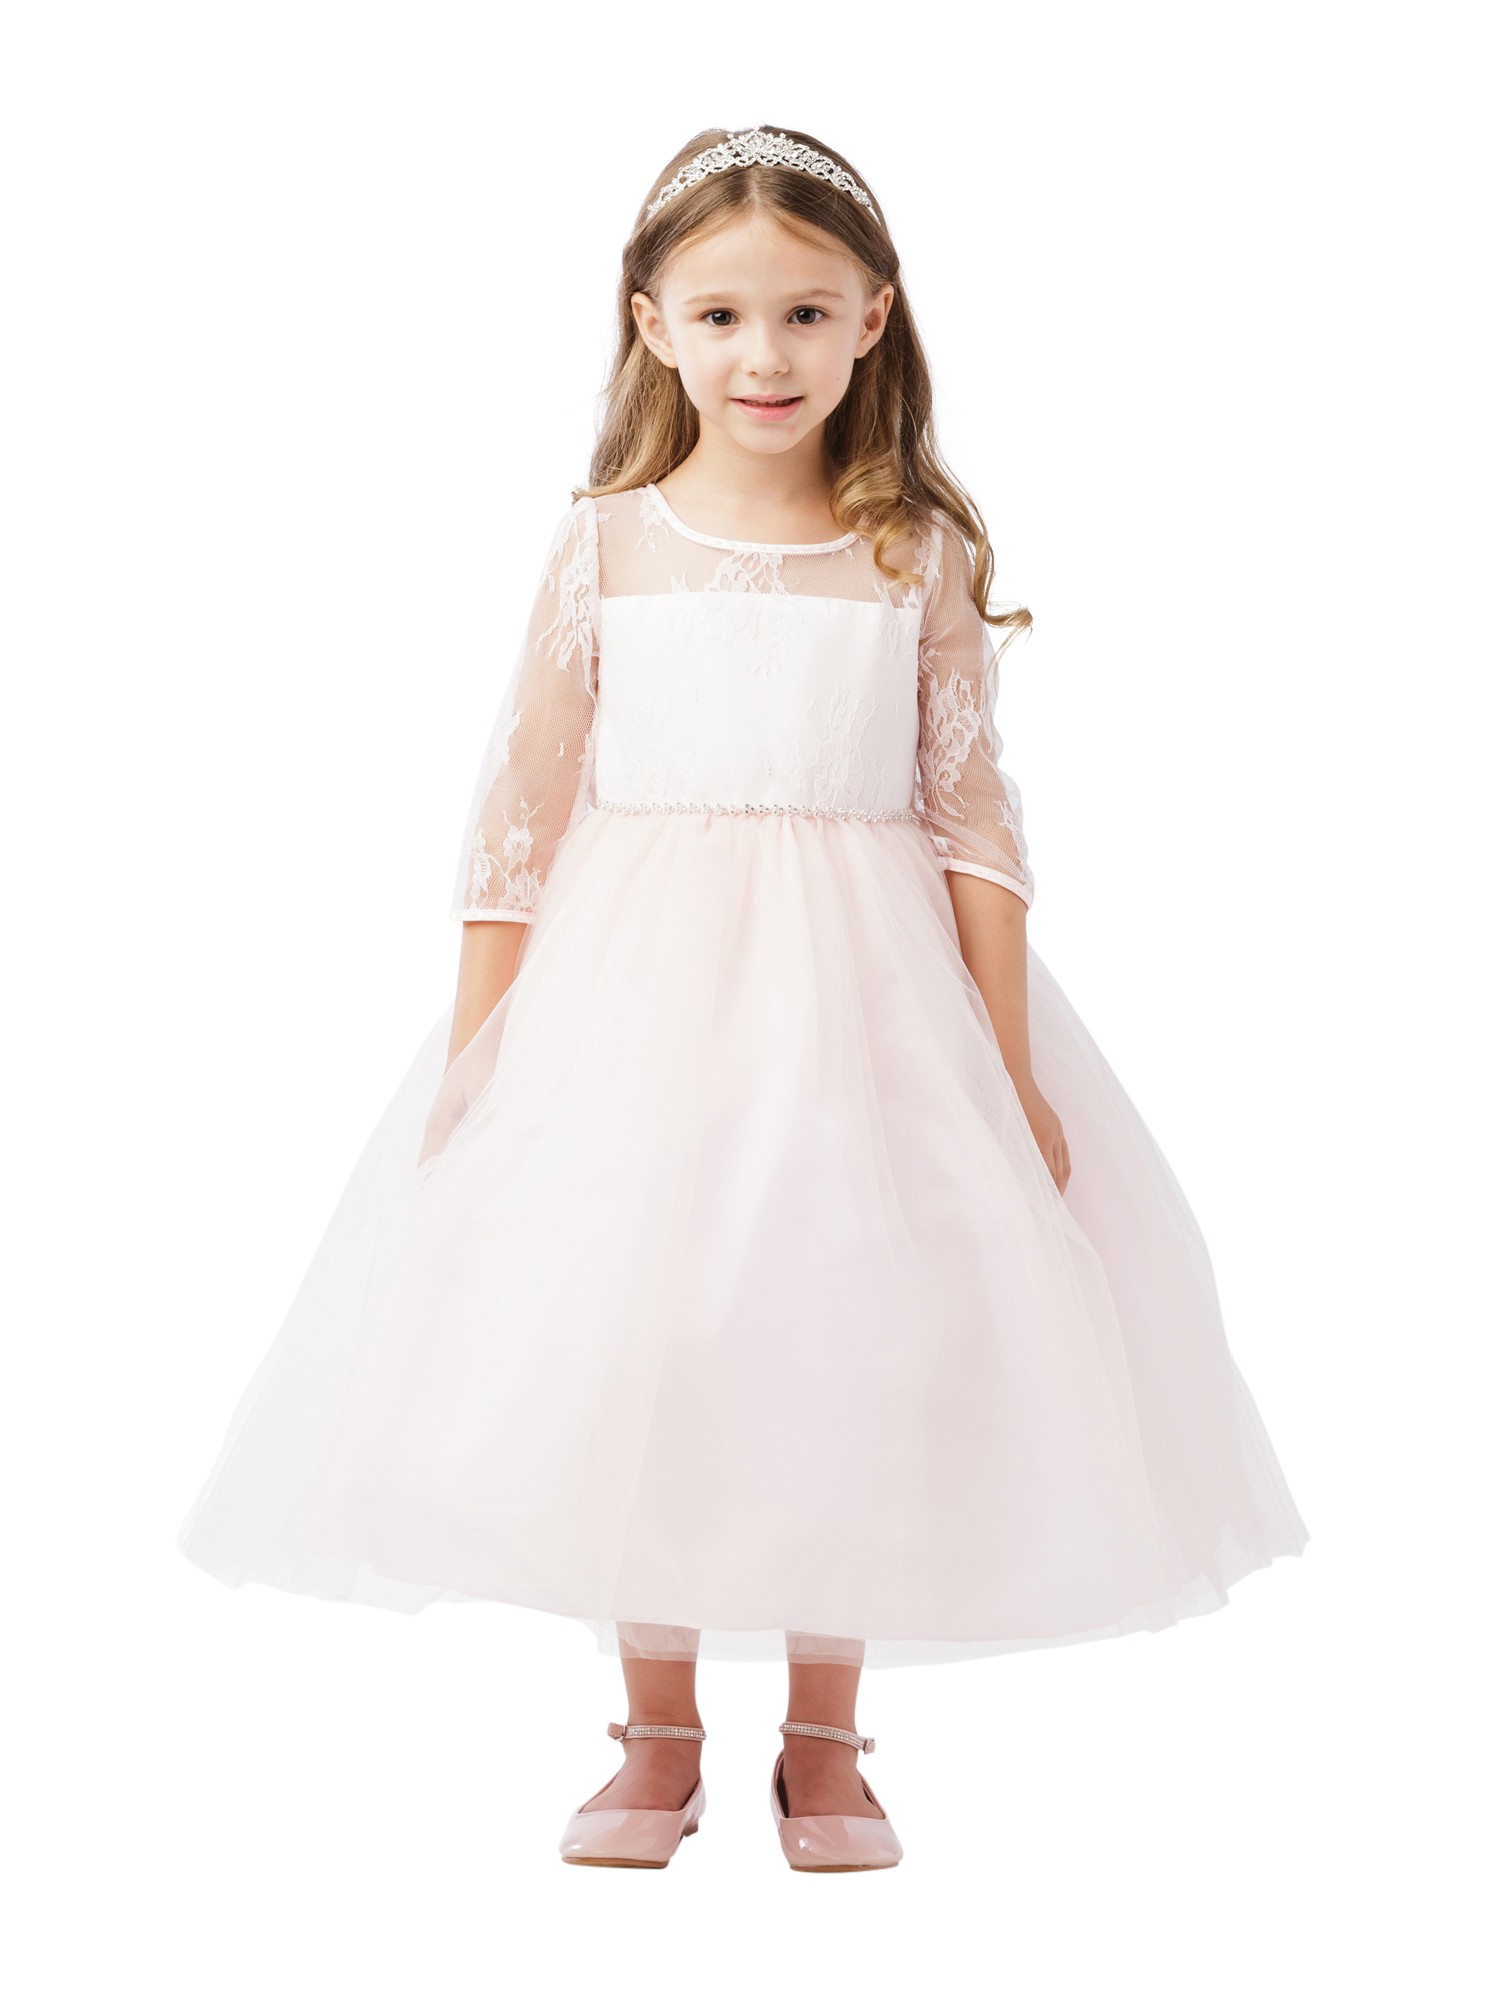 662049cf2a60 Jr Bridesmaid Dresses Blush | Saddha